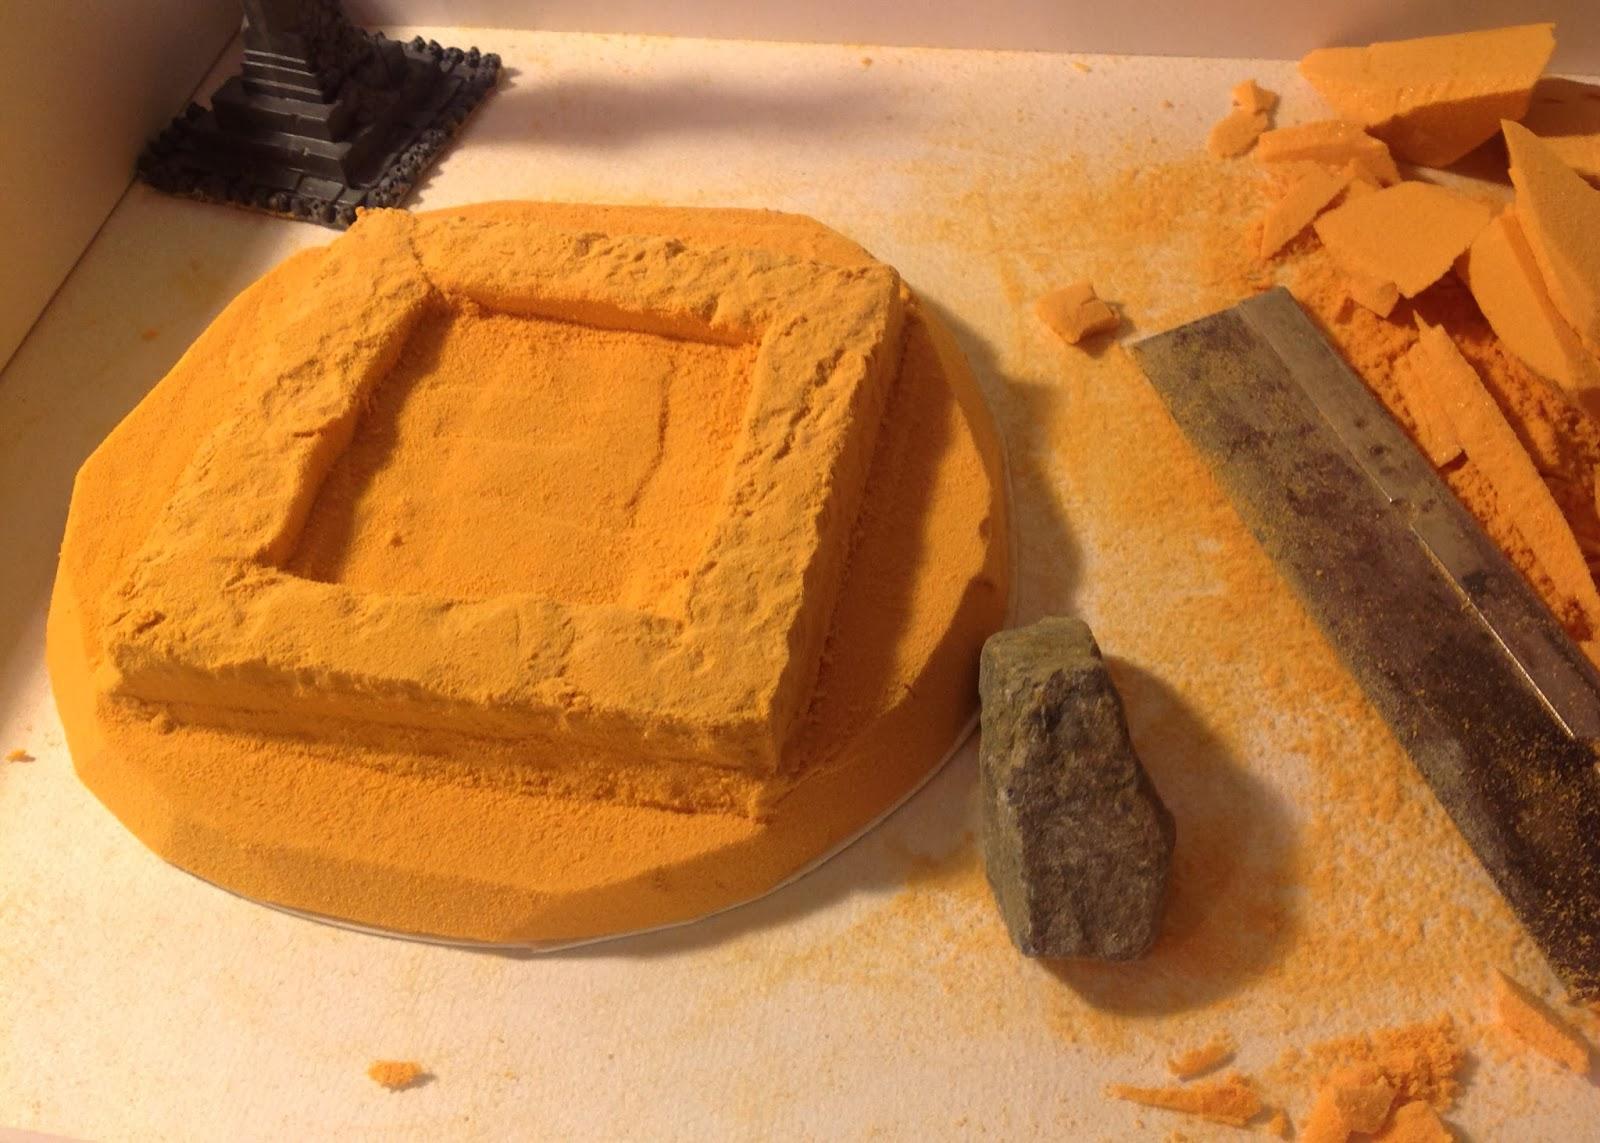 Citadel fantasy terrain enhancement with balsa foam